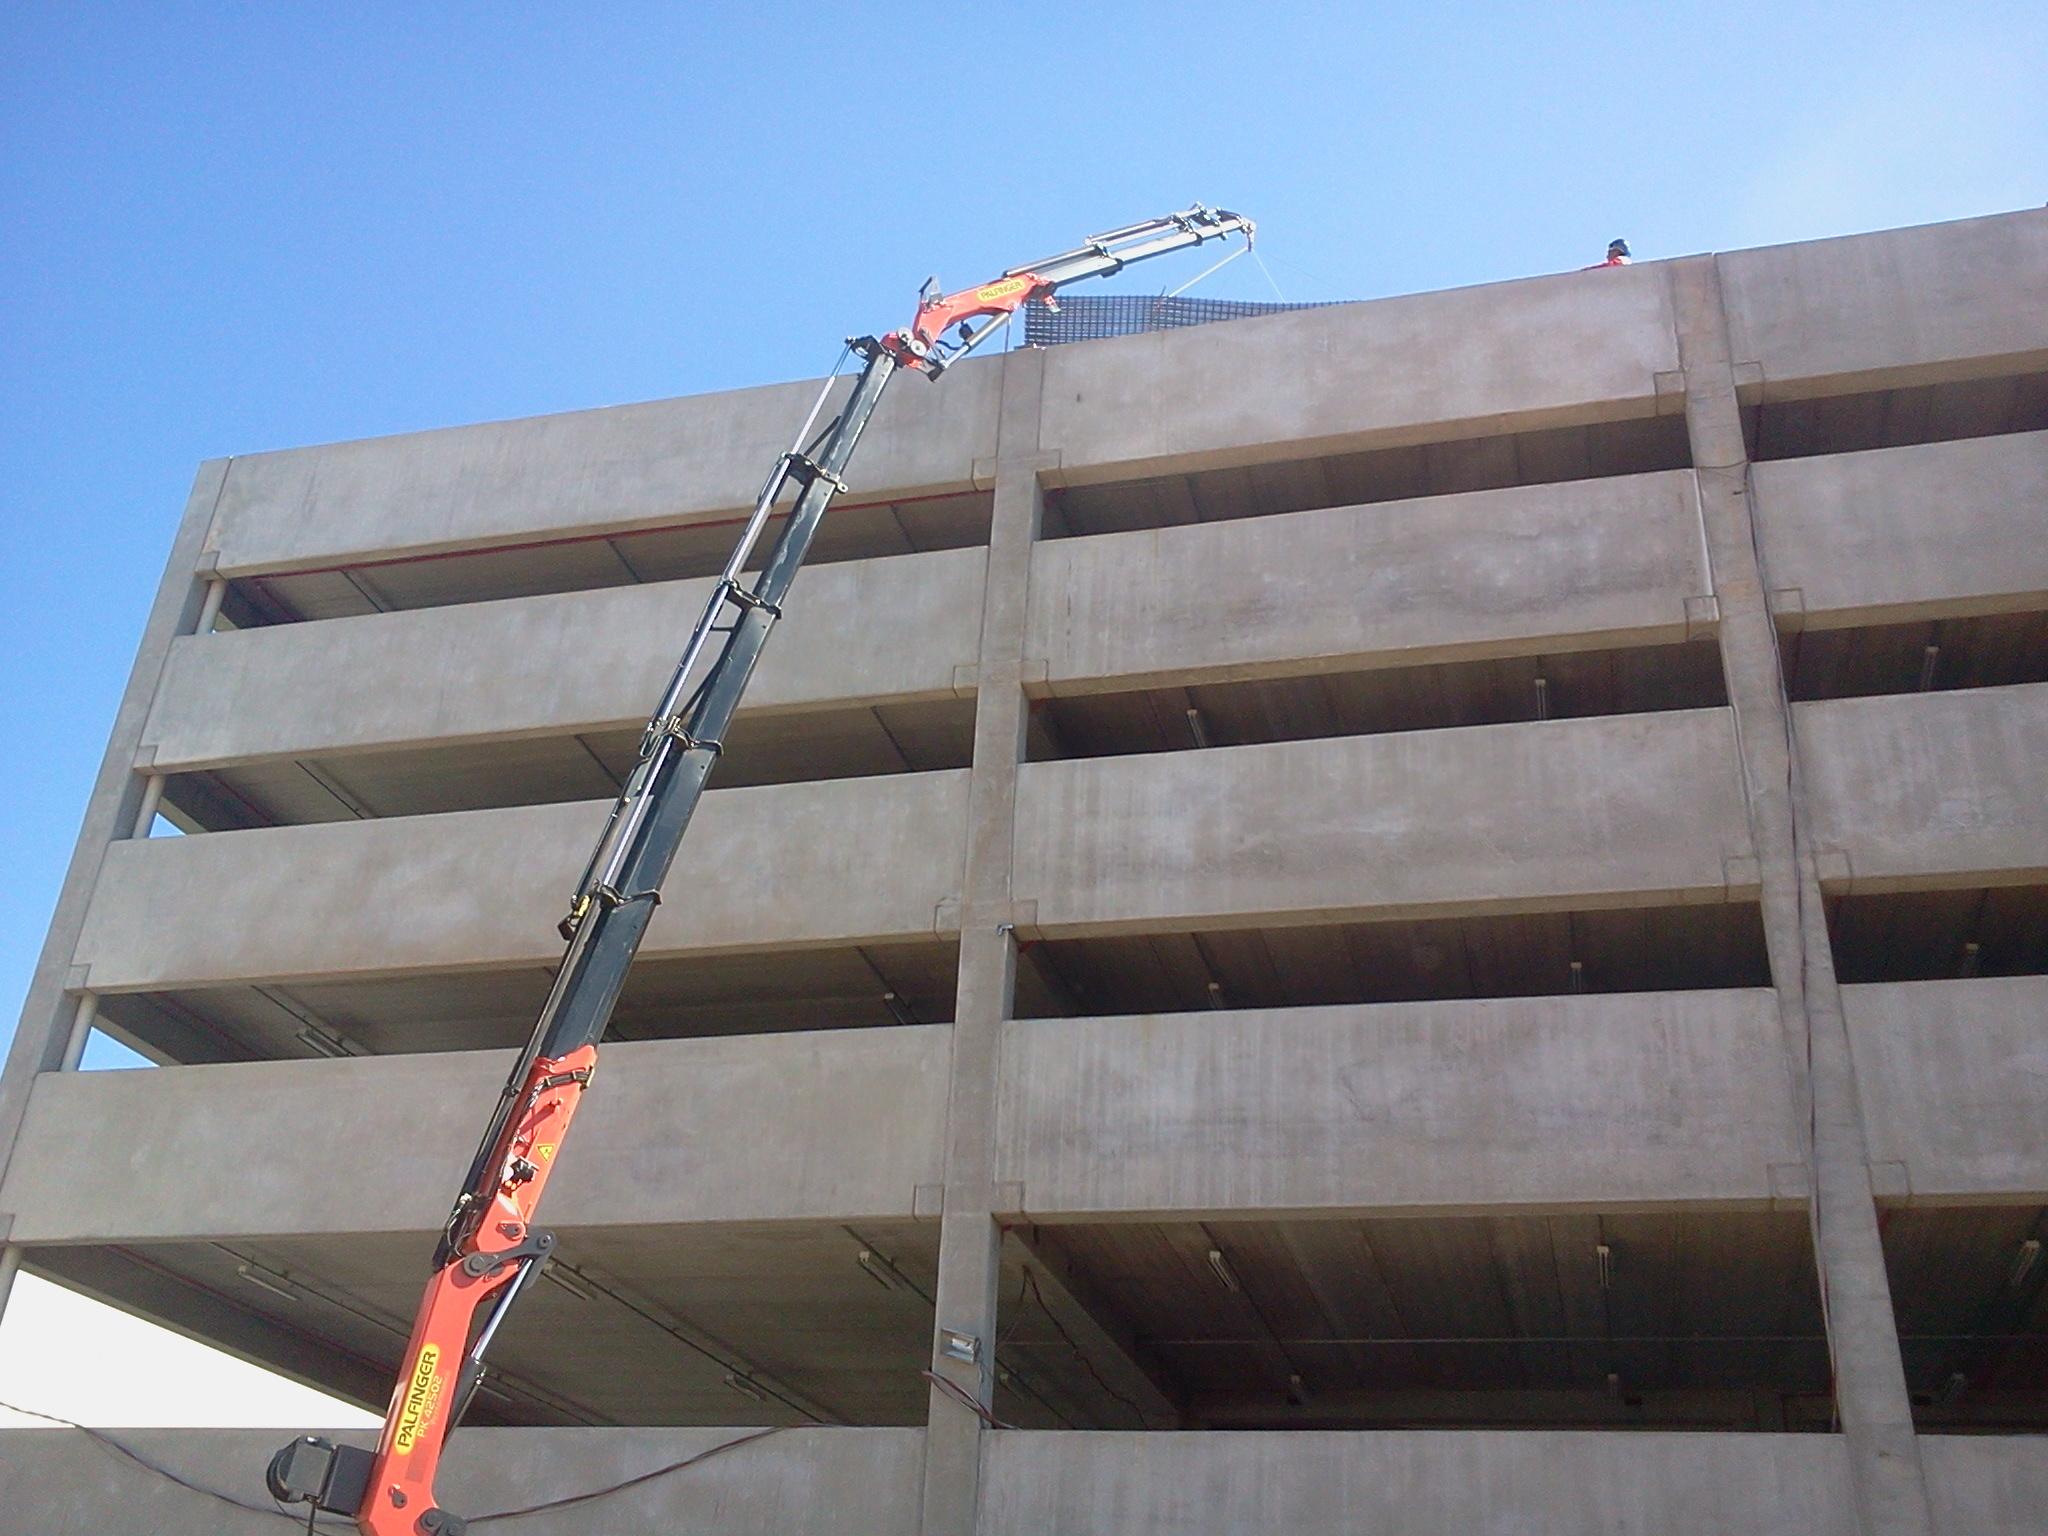 Carga de 850 kg colocada a 20 metros de altura.